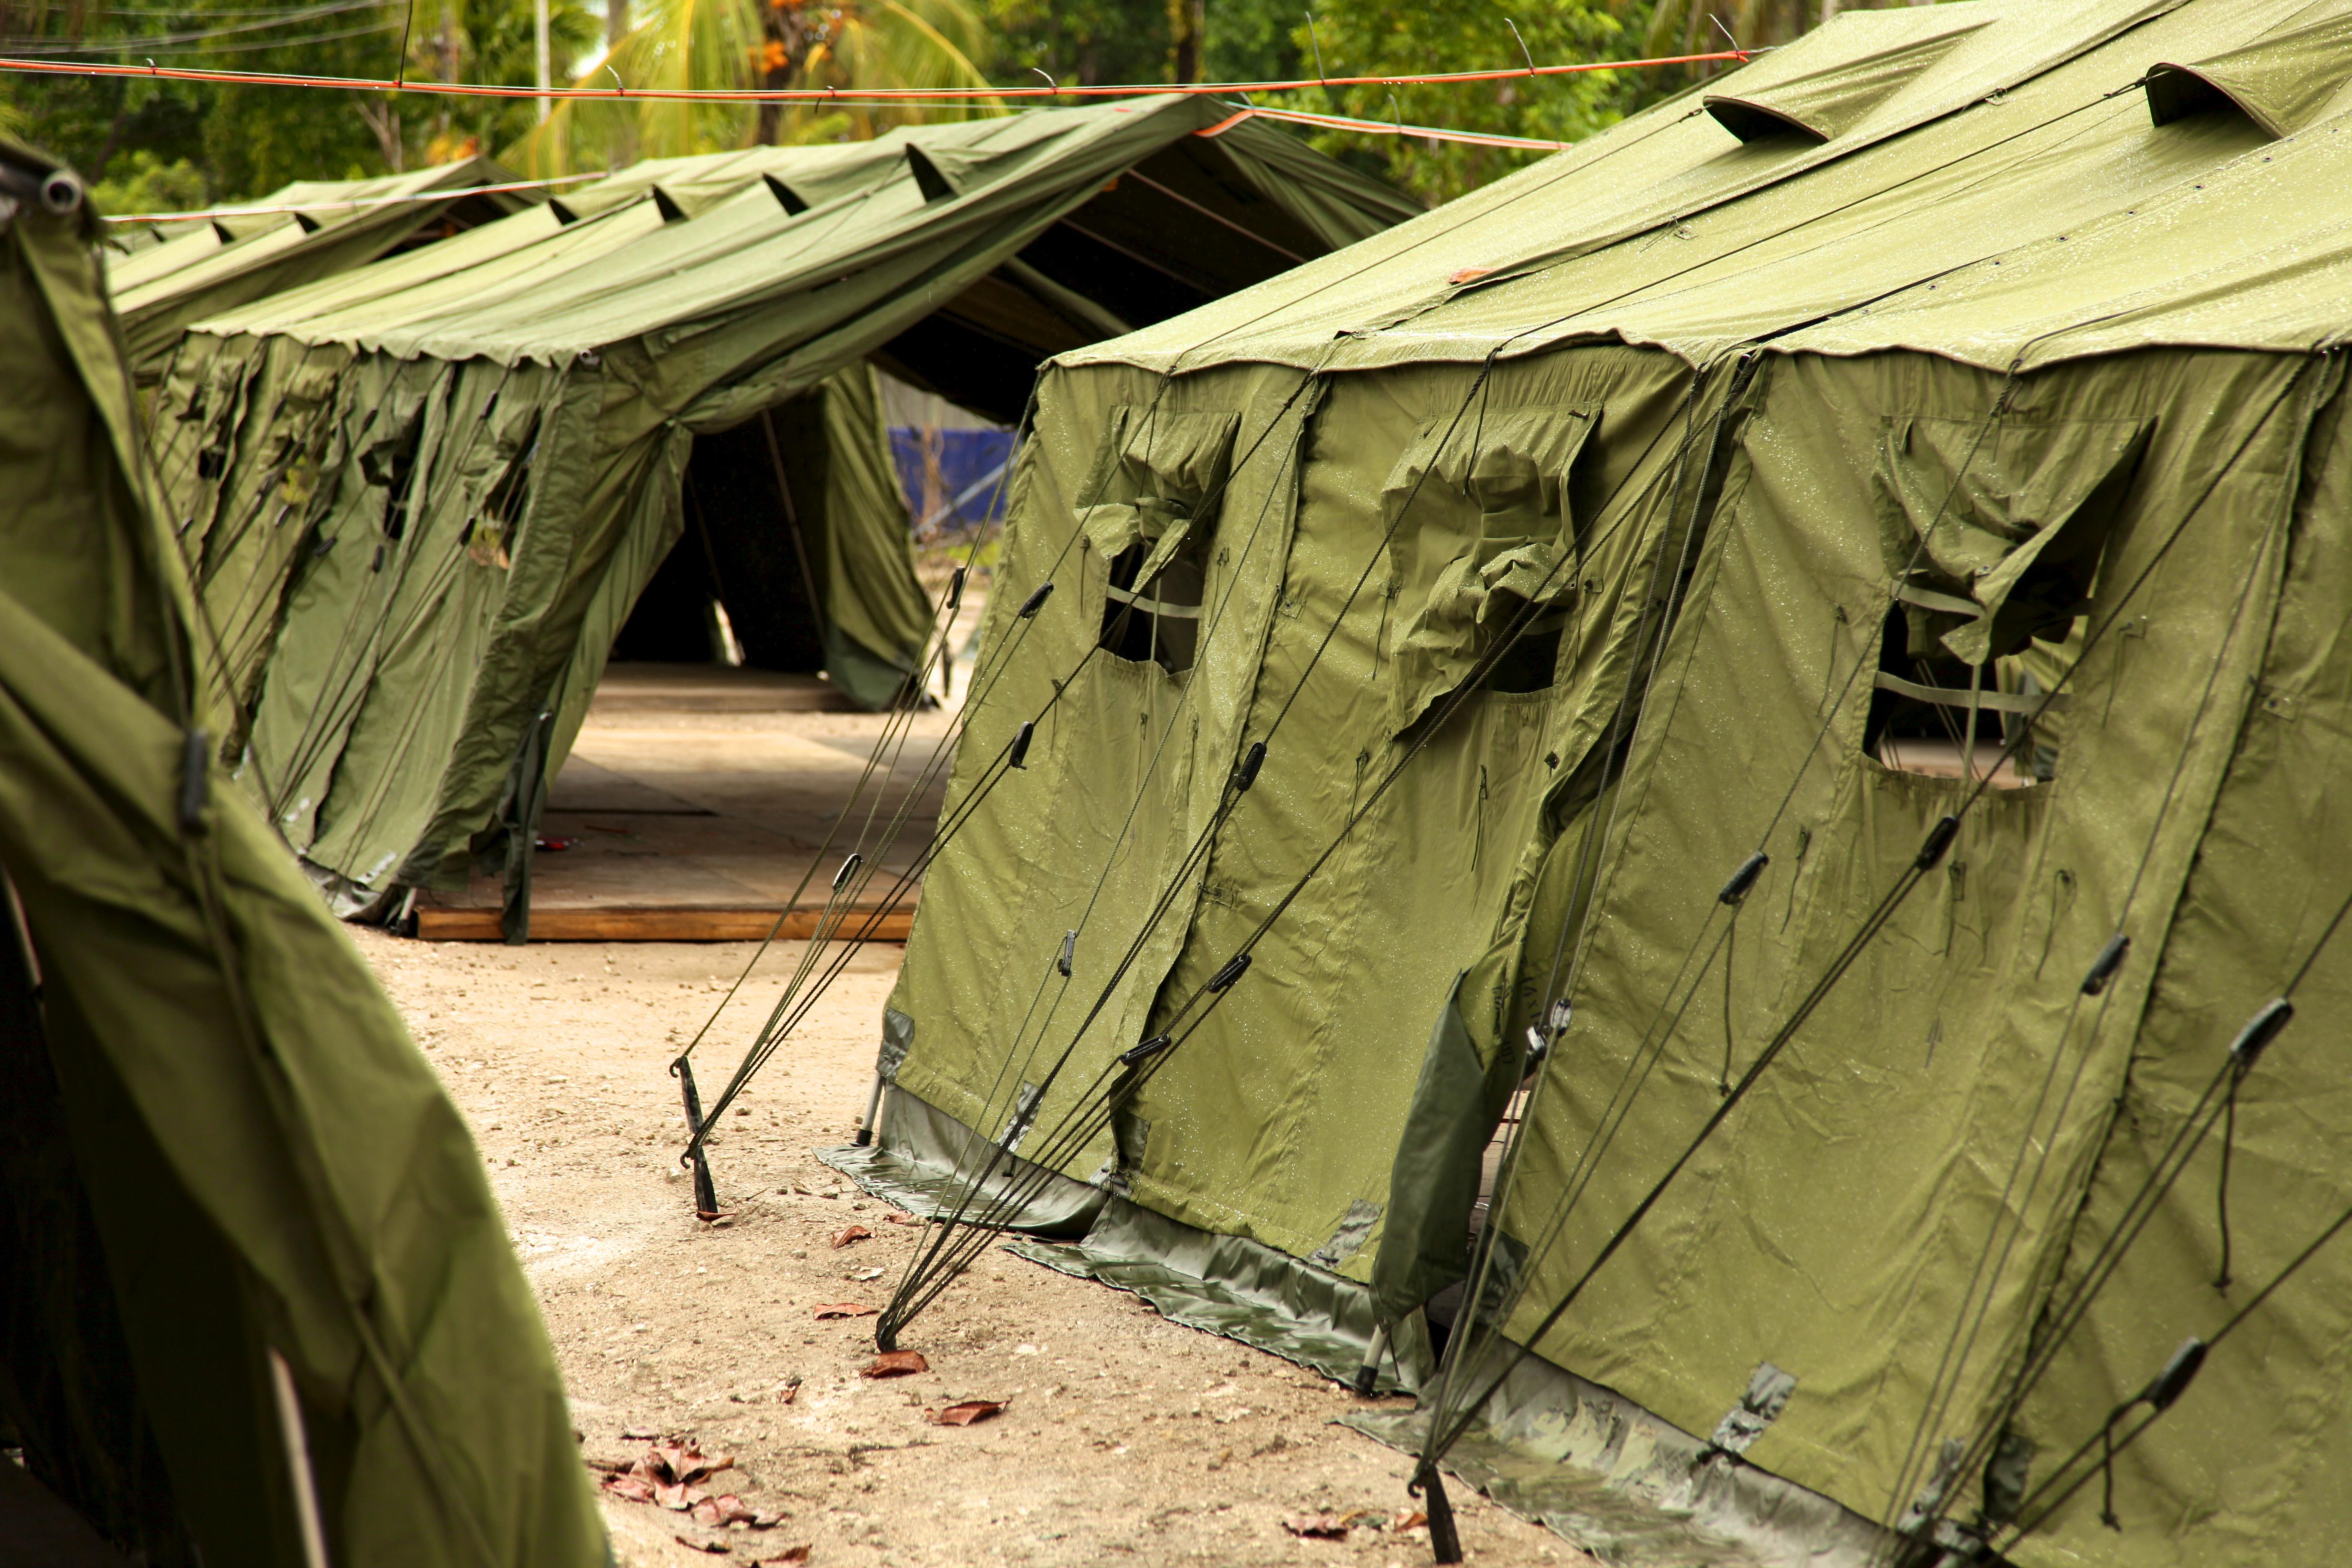 Australia lawmakers approve legislation allowing Manus Island asylum seekers to receive medical care in Australia